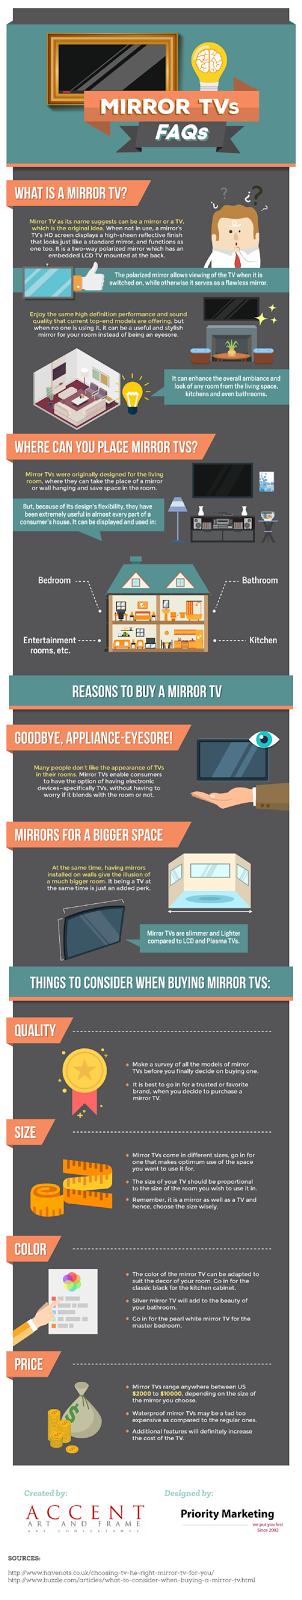 mirror-tvs-faqs